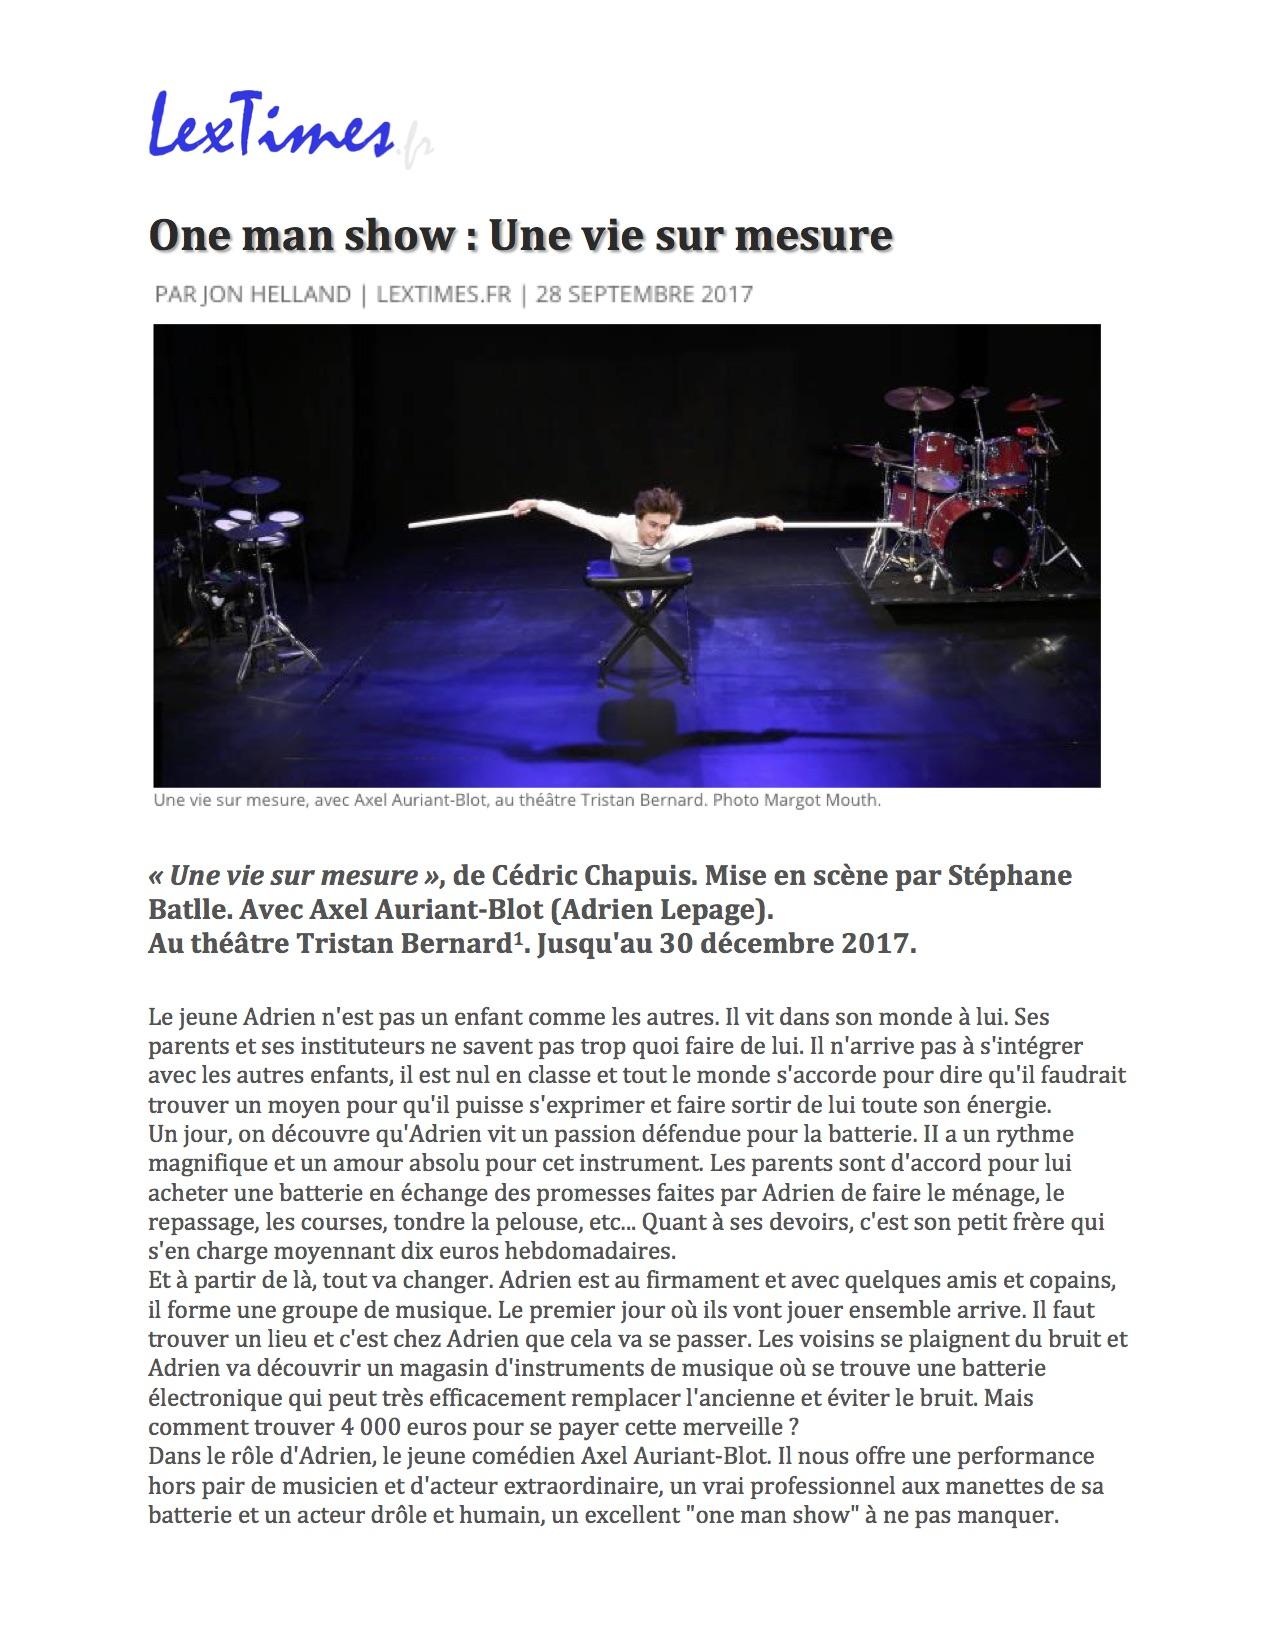 Lextimes.fr 29.09.17